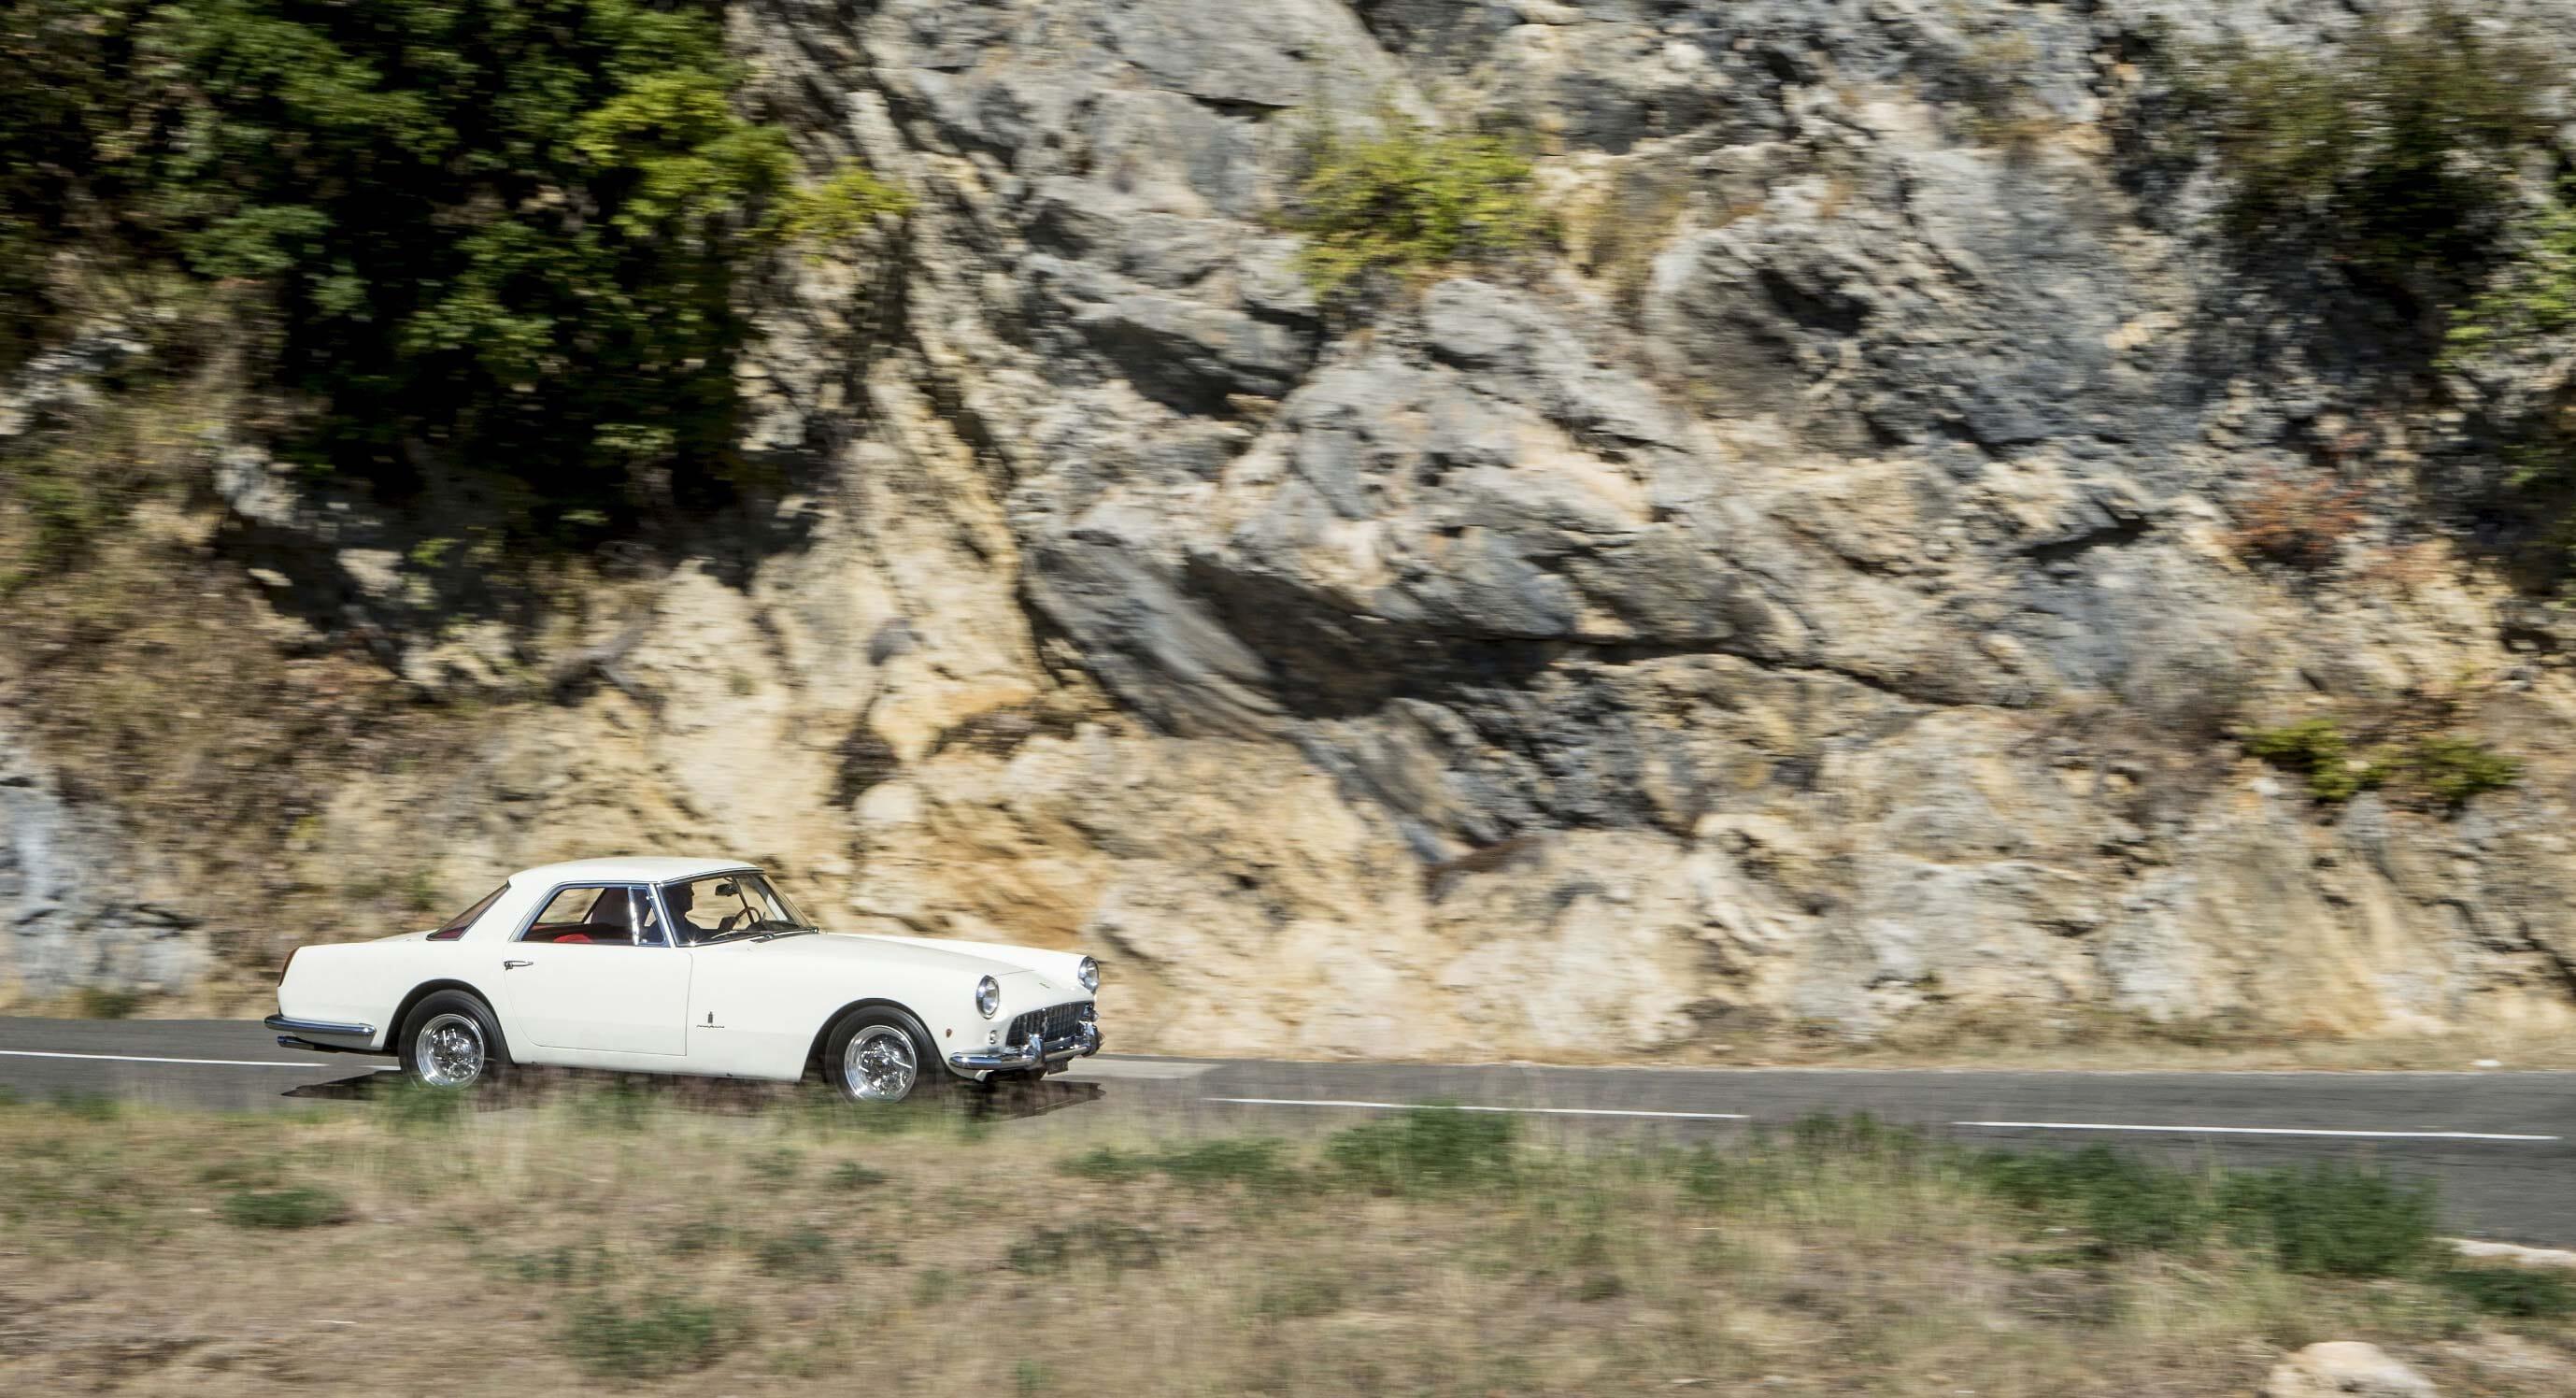 Classic Car Find of the Week: 1960 Ferrari 250 GT Series II Coupé